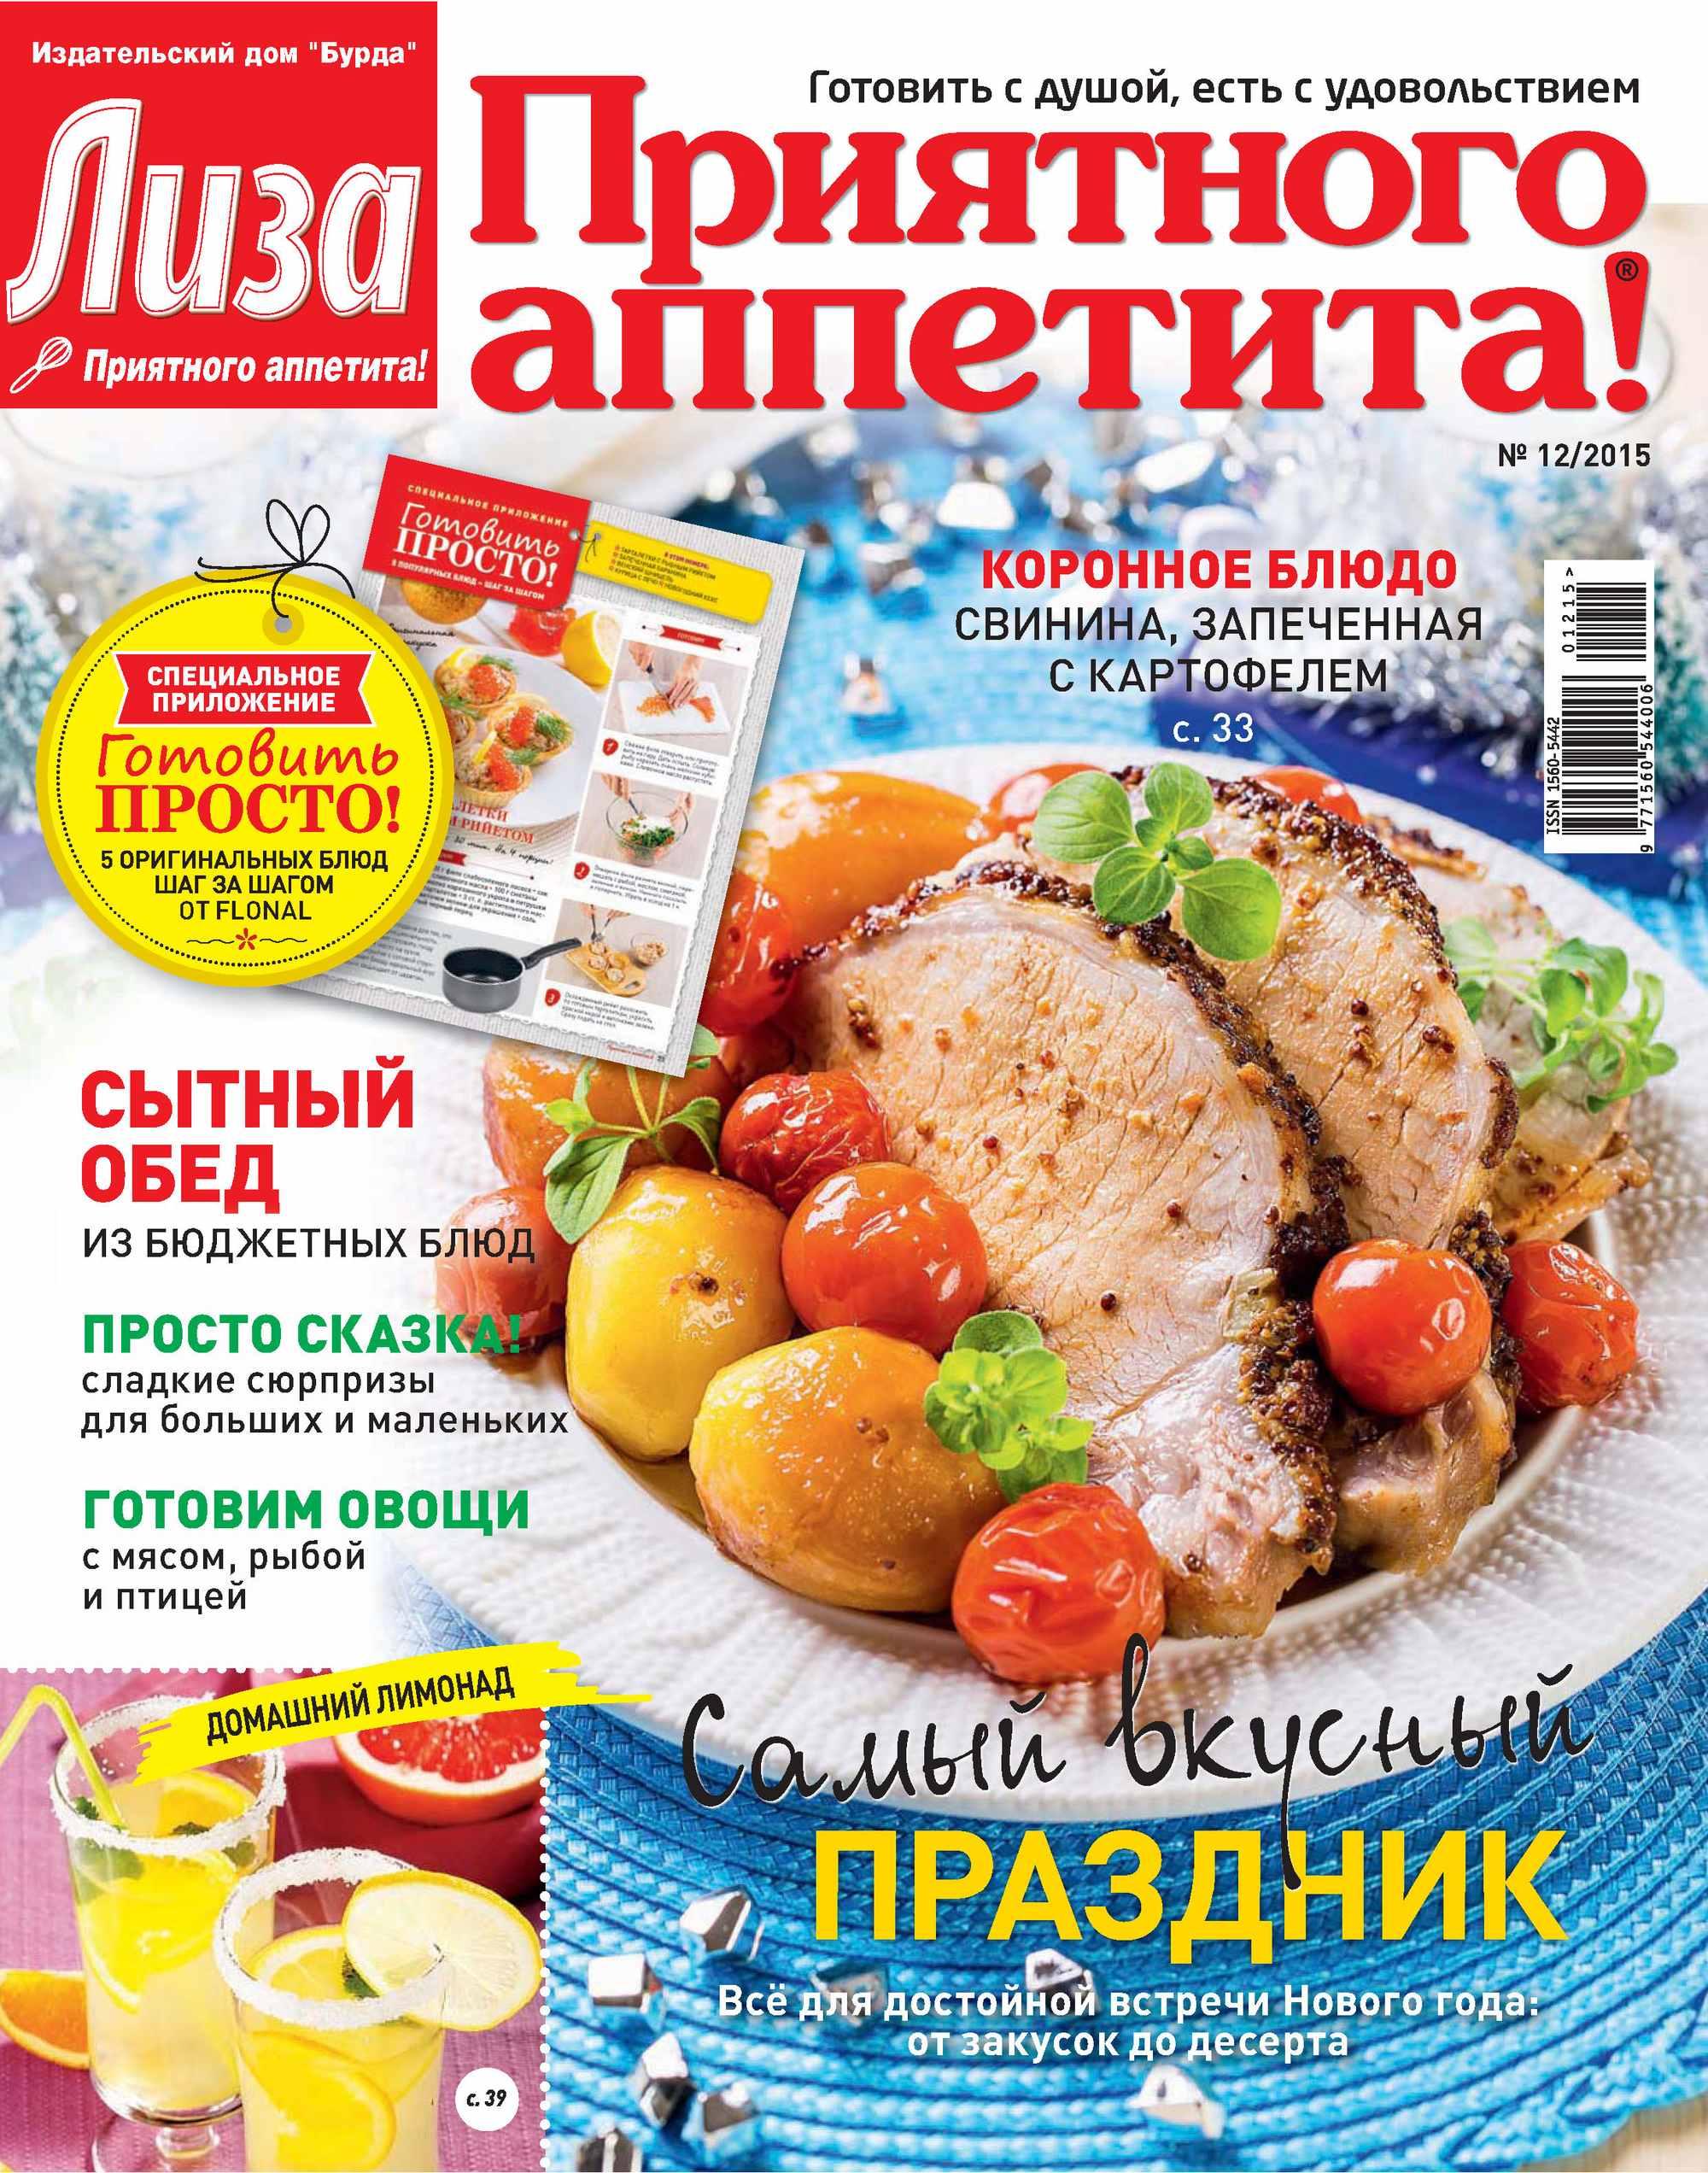 ИД «Бурда» Журнал «Лиза. Приятного аппетита» №12/2015 ид бурда журнал лиза приятного аппетита 04 2015